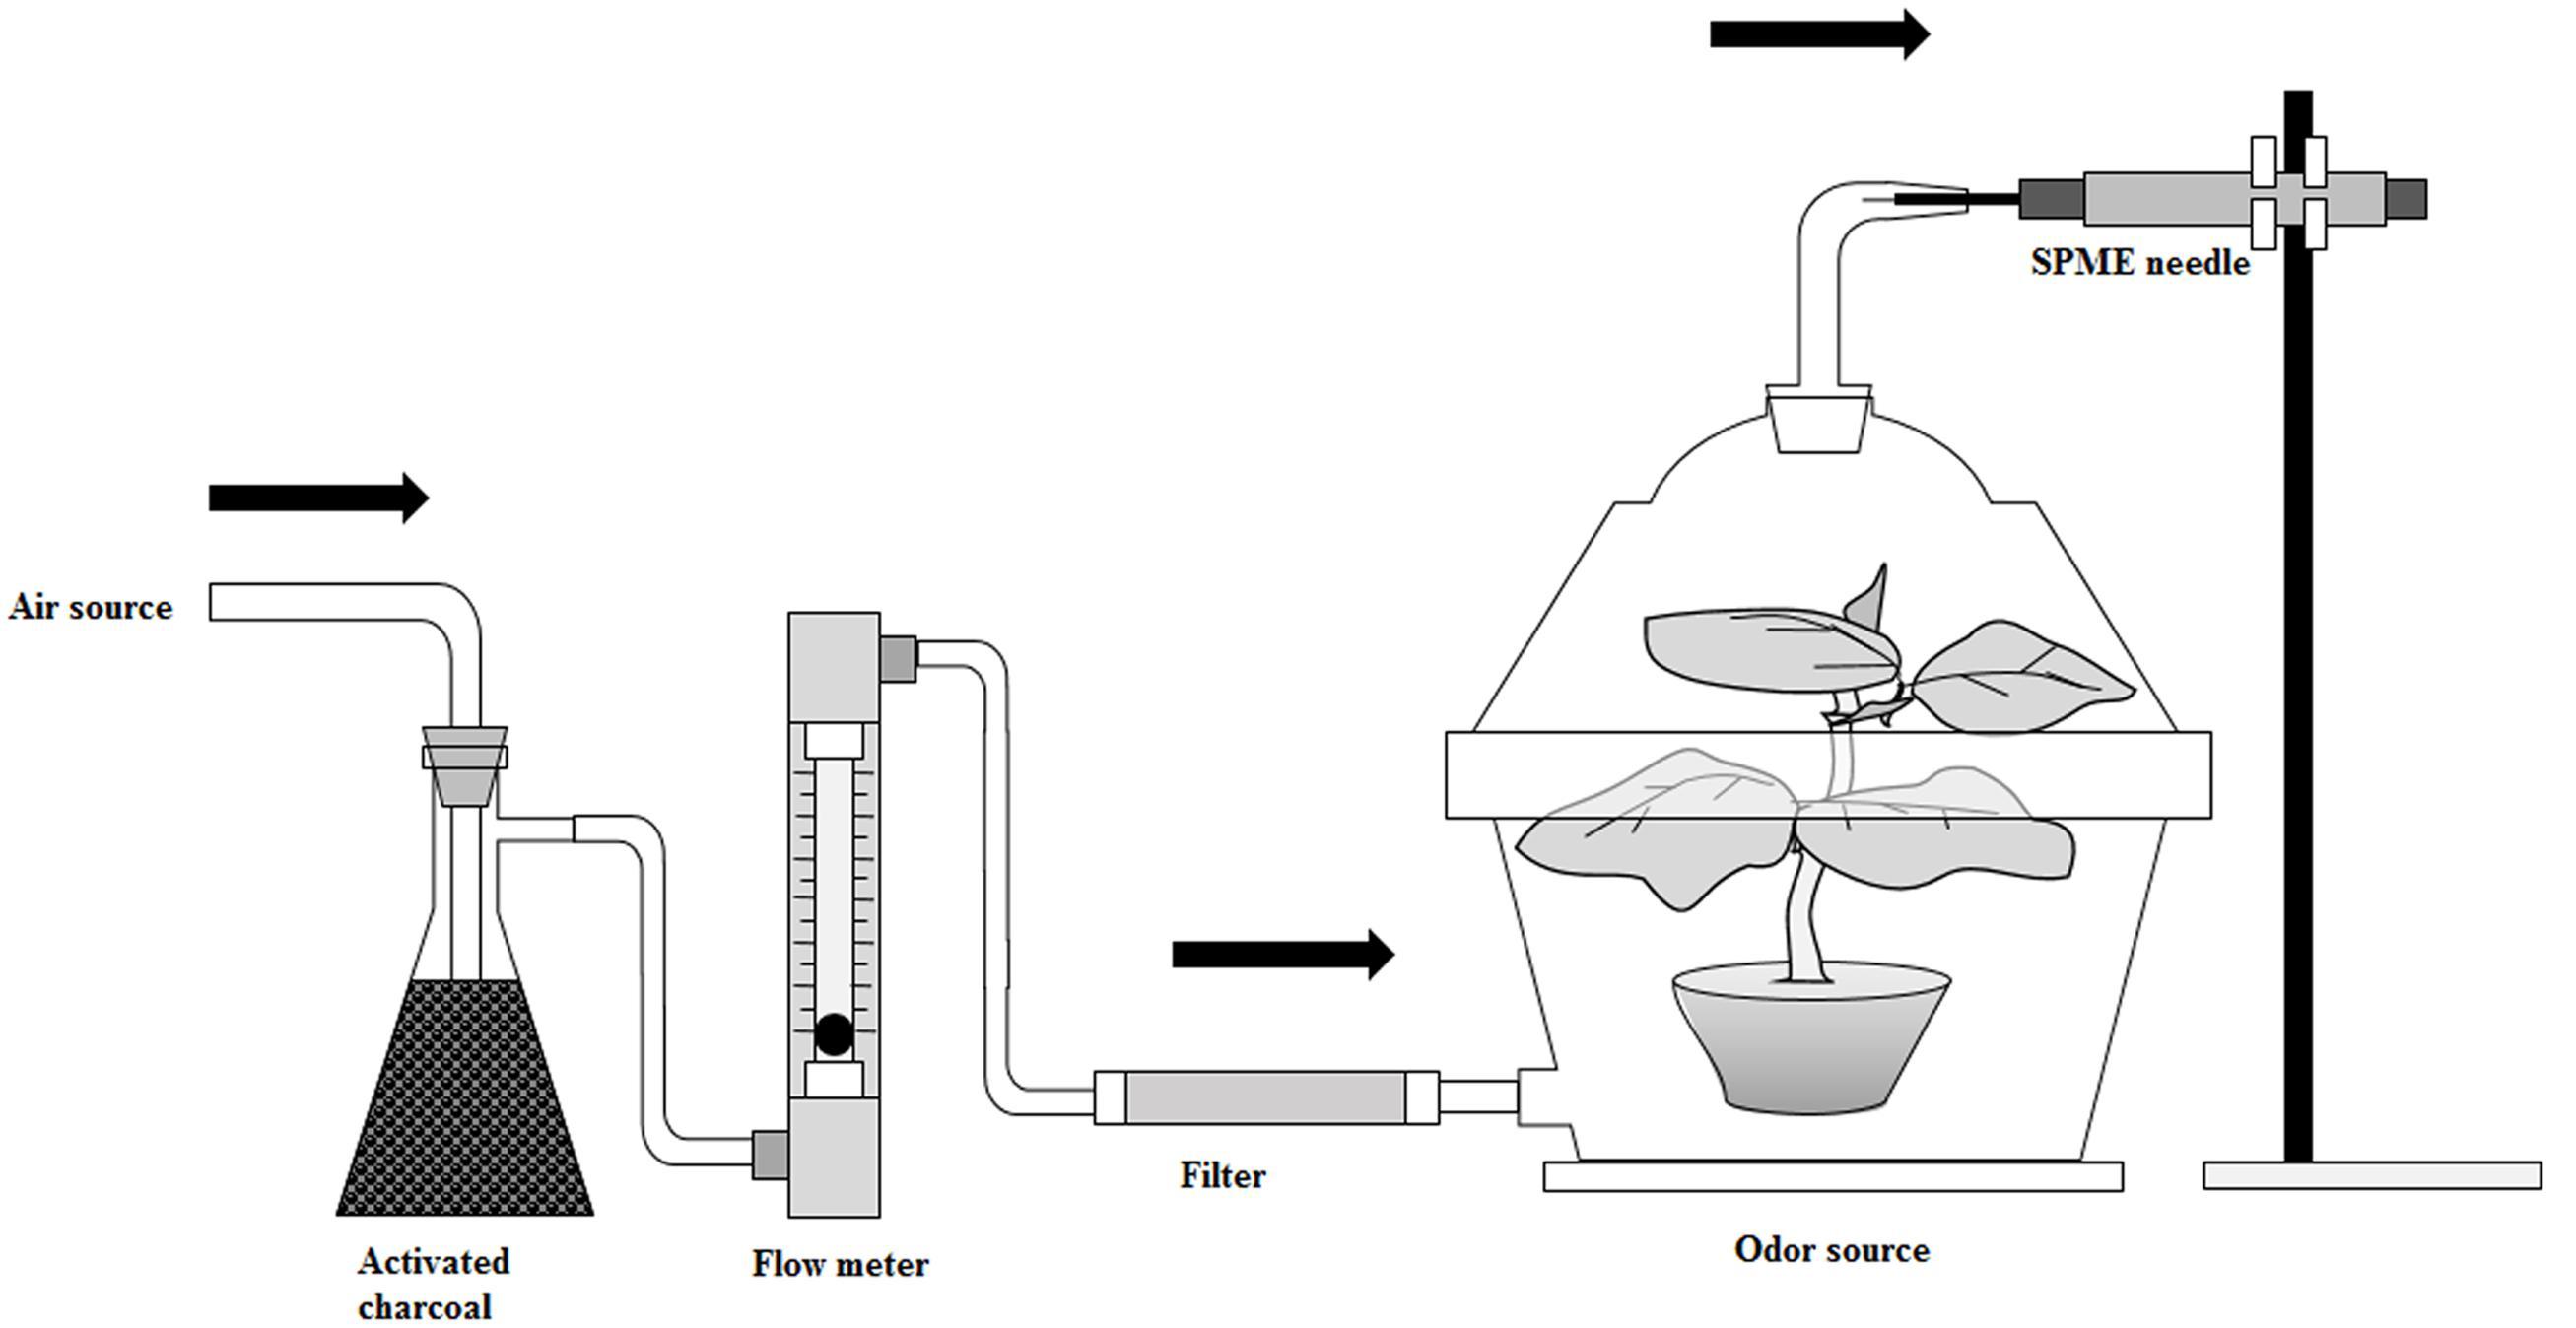 Frontiers High Level Of Nitrogen Makes Tomato Plants Releasing Zkhxwindpowerdiagramgif